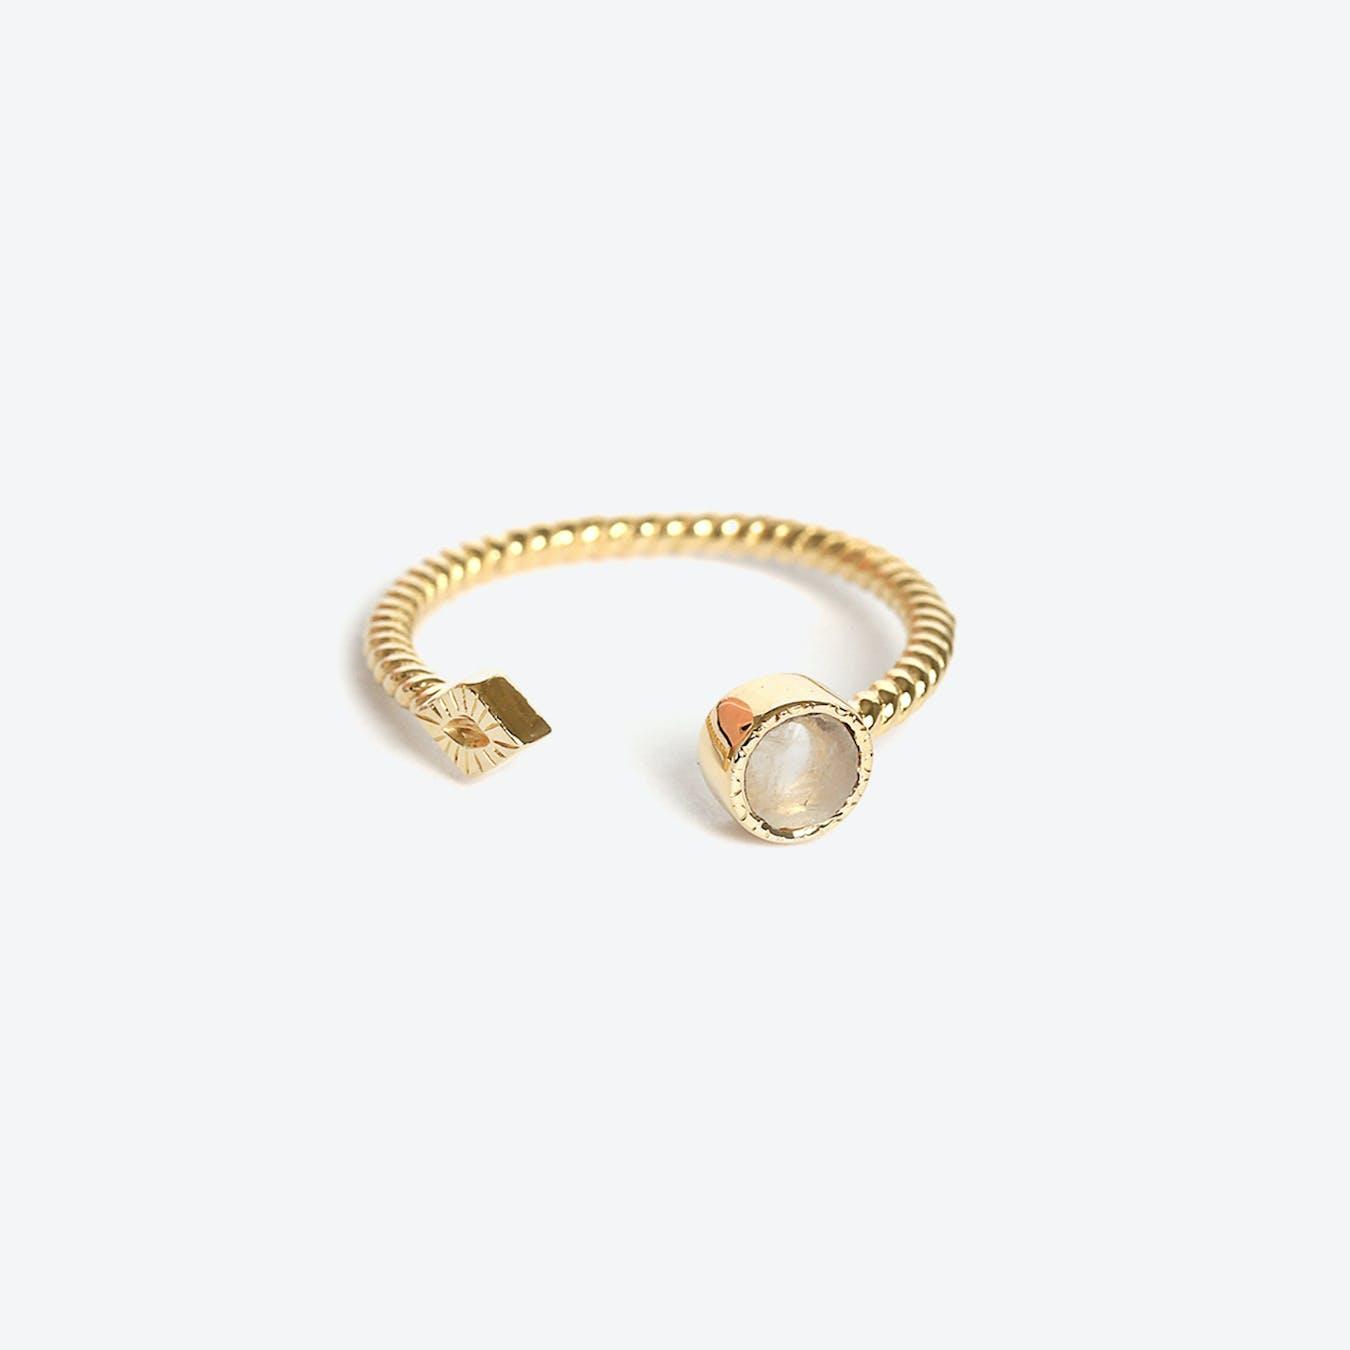 Livy Ring - Moonstone